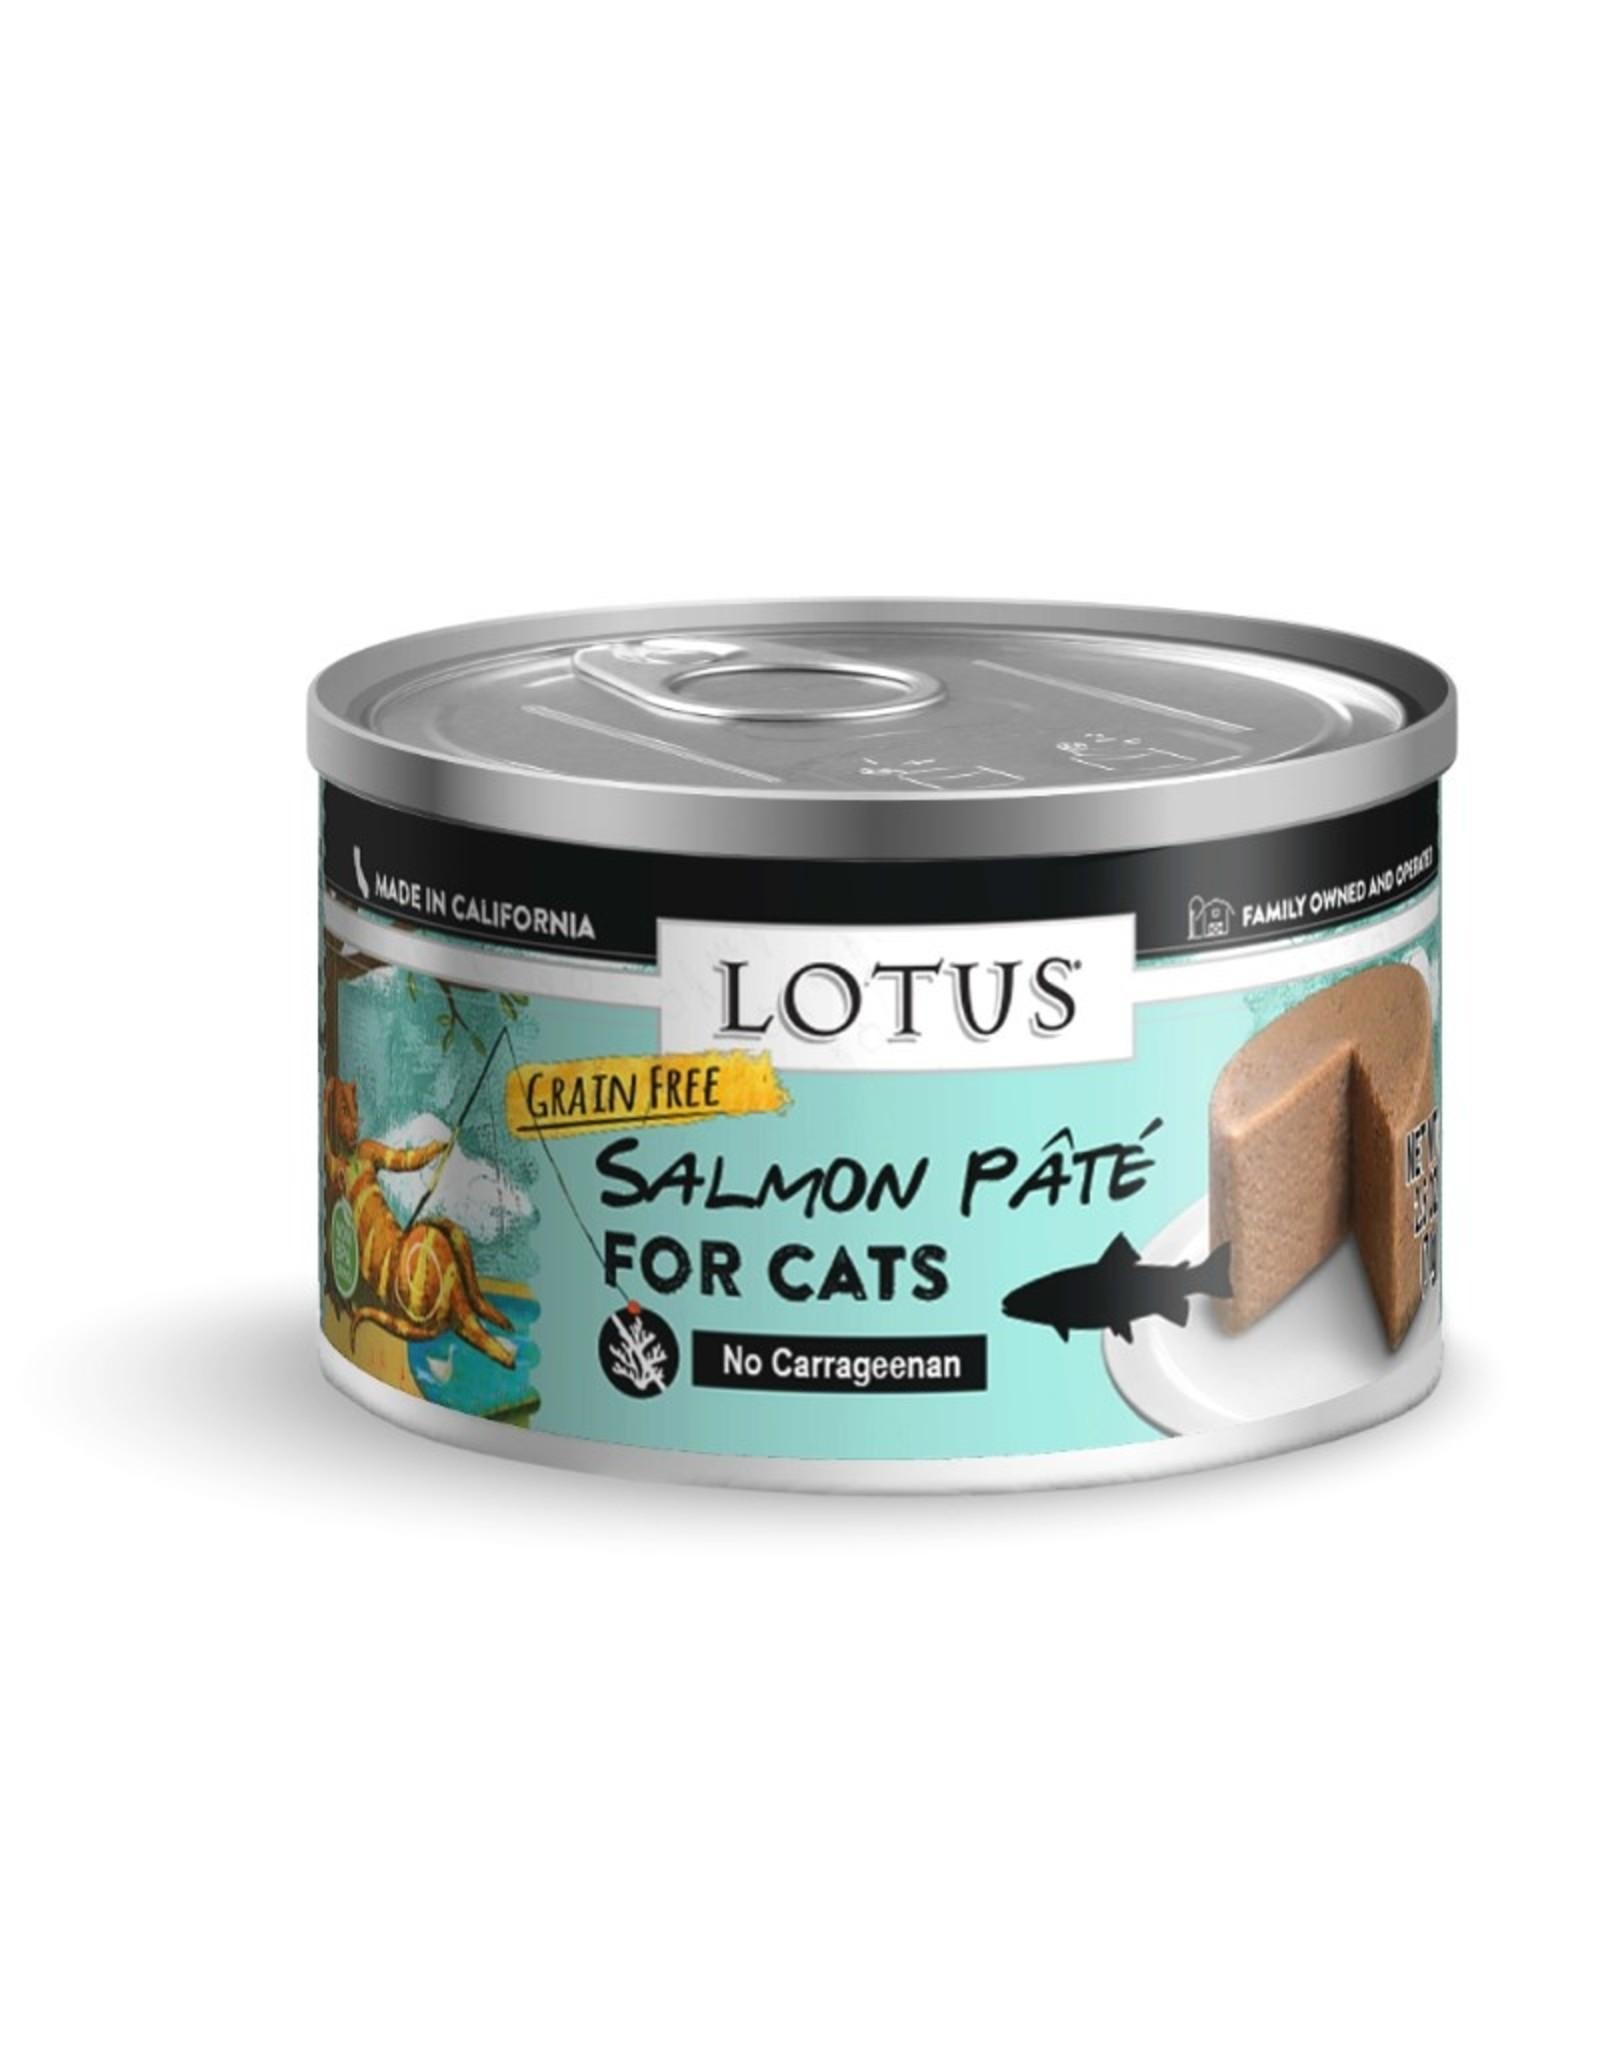 Lotus Pet Food Lotus Pet Food Cat Salmon Pate